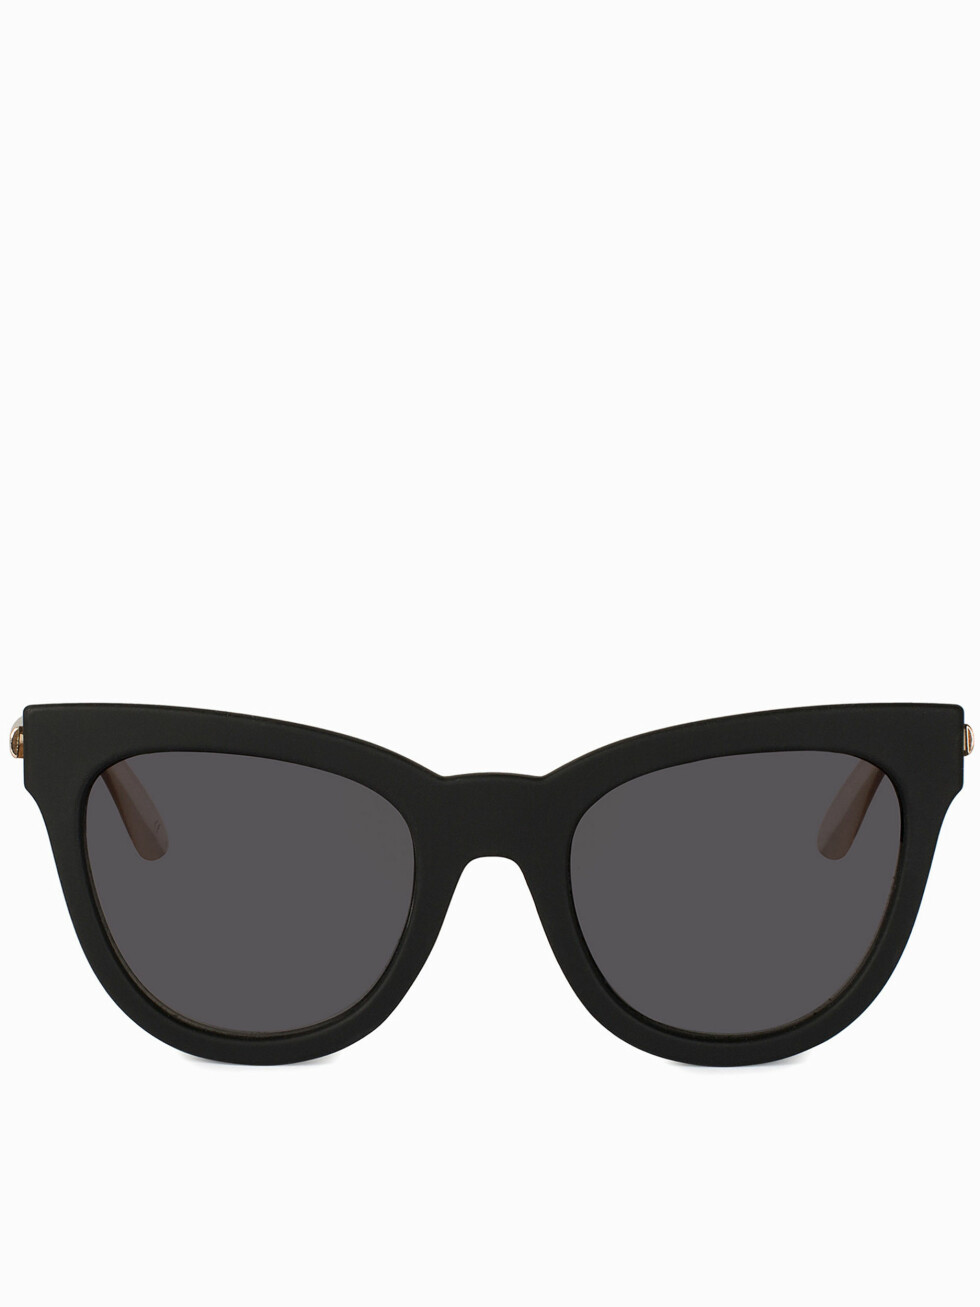 <strong>CAT EYE:</strong> Slik ser en solbrille med cat eye-form. De med kvadratisk og ovalt ansikt kler disse godt! Dersom du har langt eller rundt ansikt, er kanskje ikke dette den heldigste formen på solbrille for deg. Foto: Nelly.com